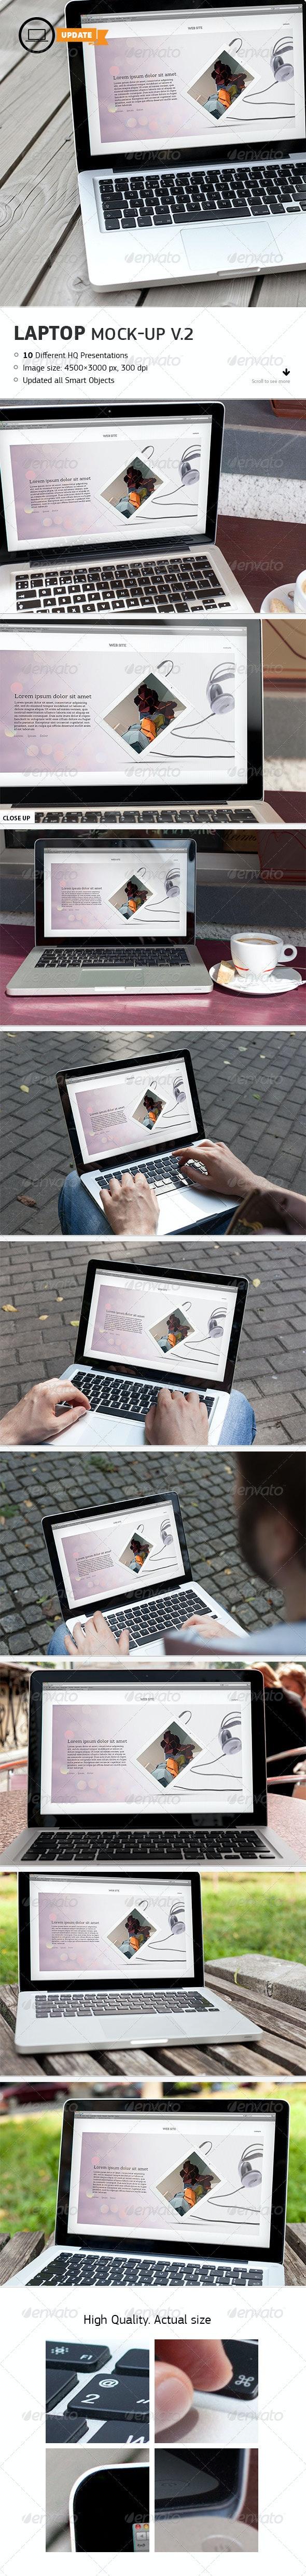 10 Laptop Mockups Vol.2 - Laptop Displays